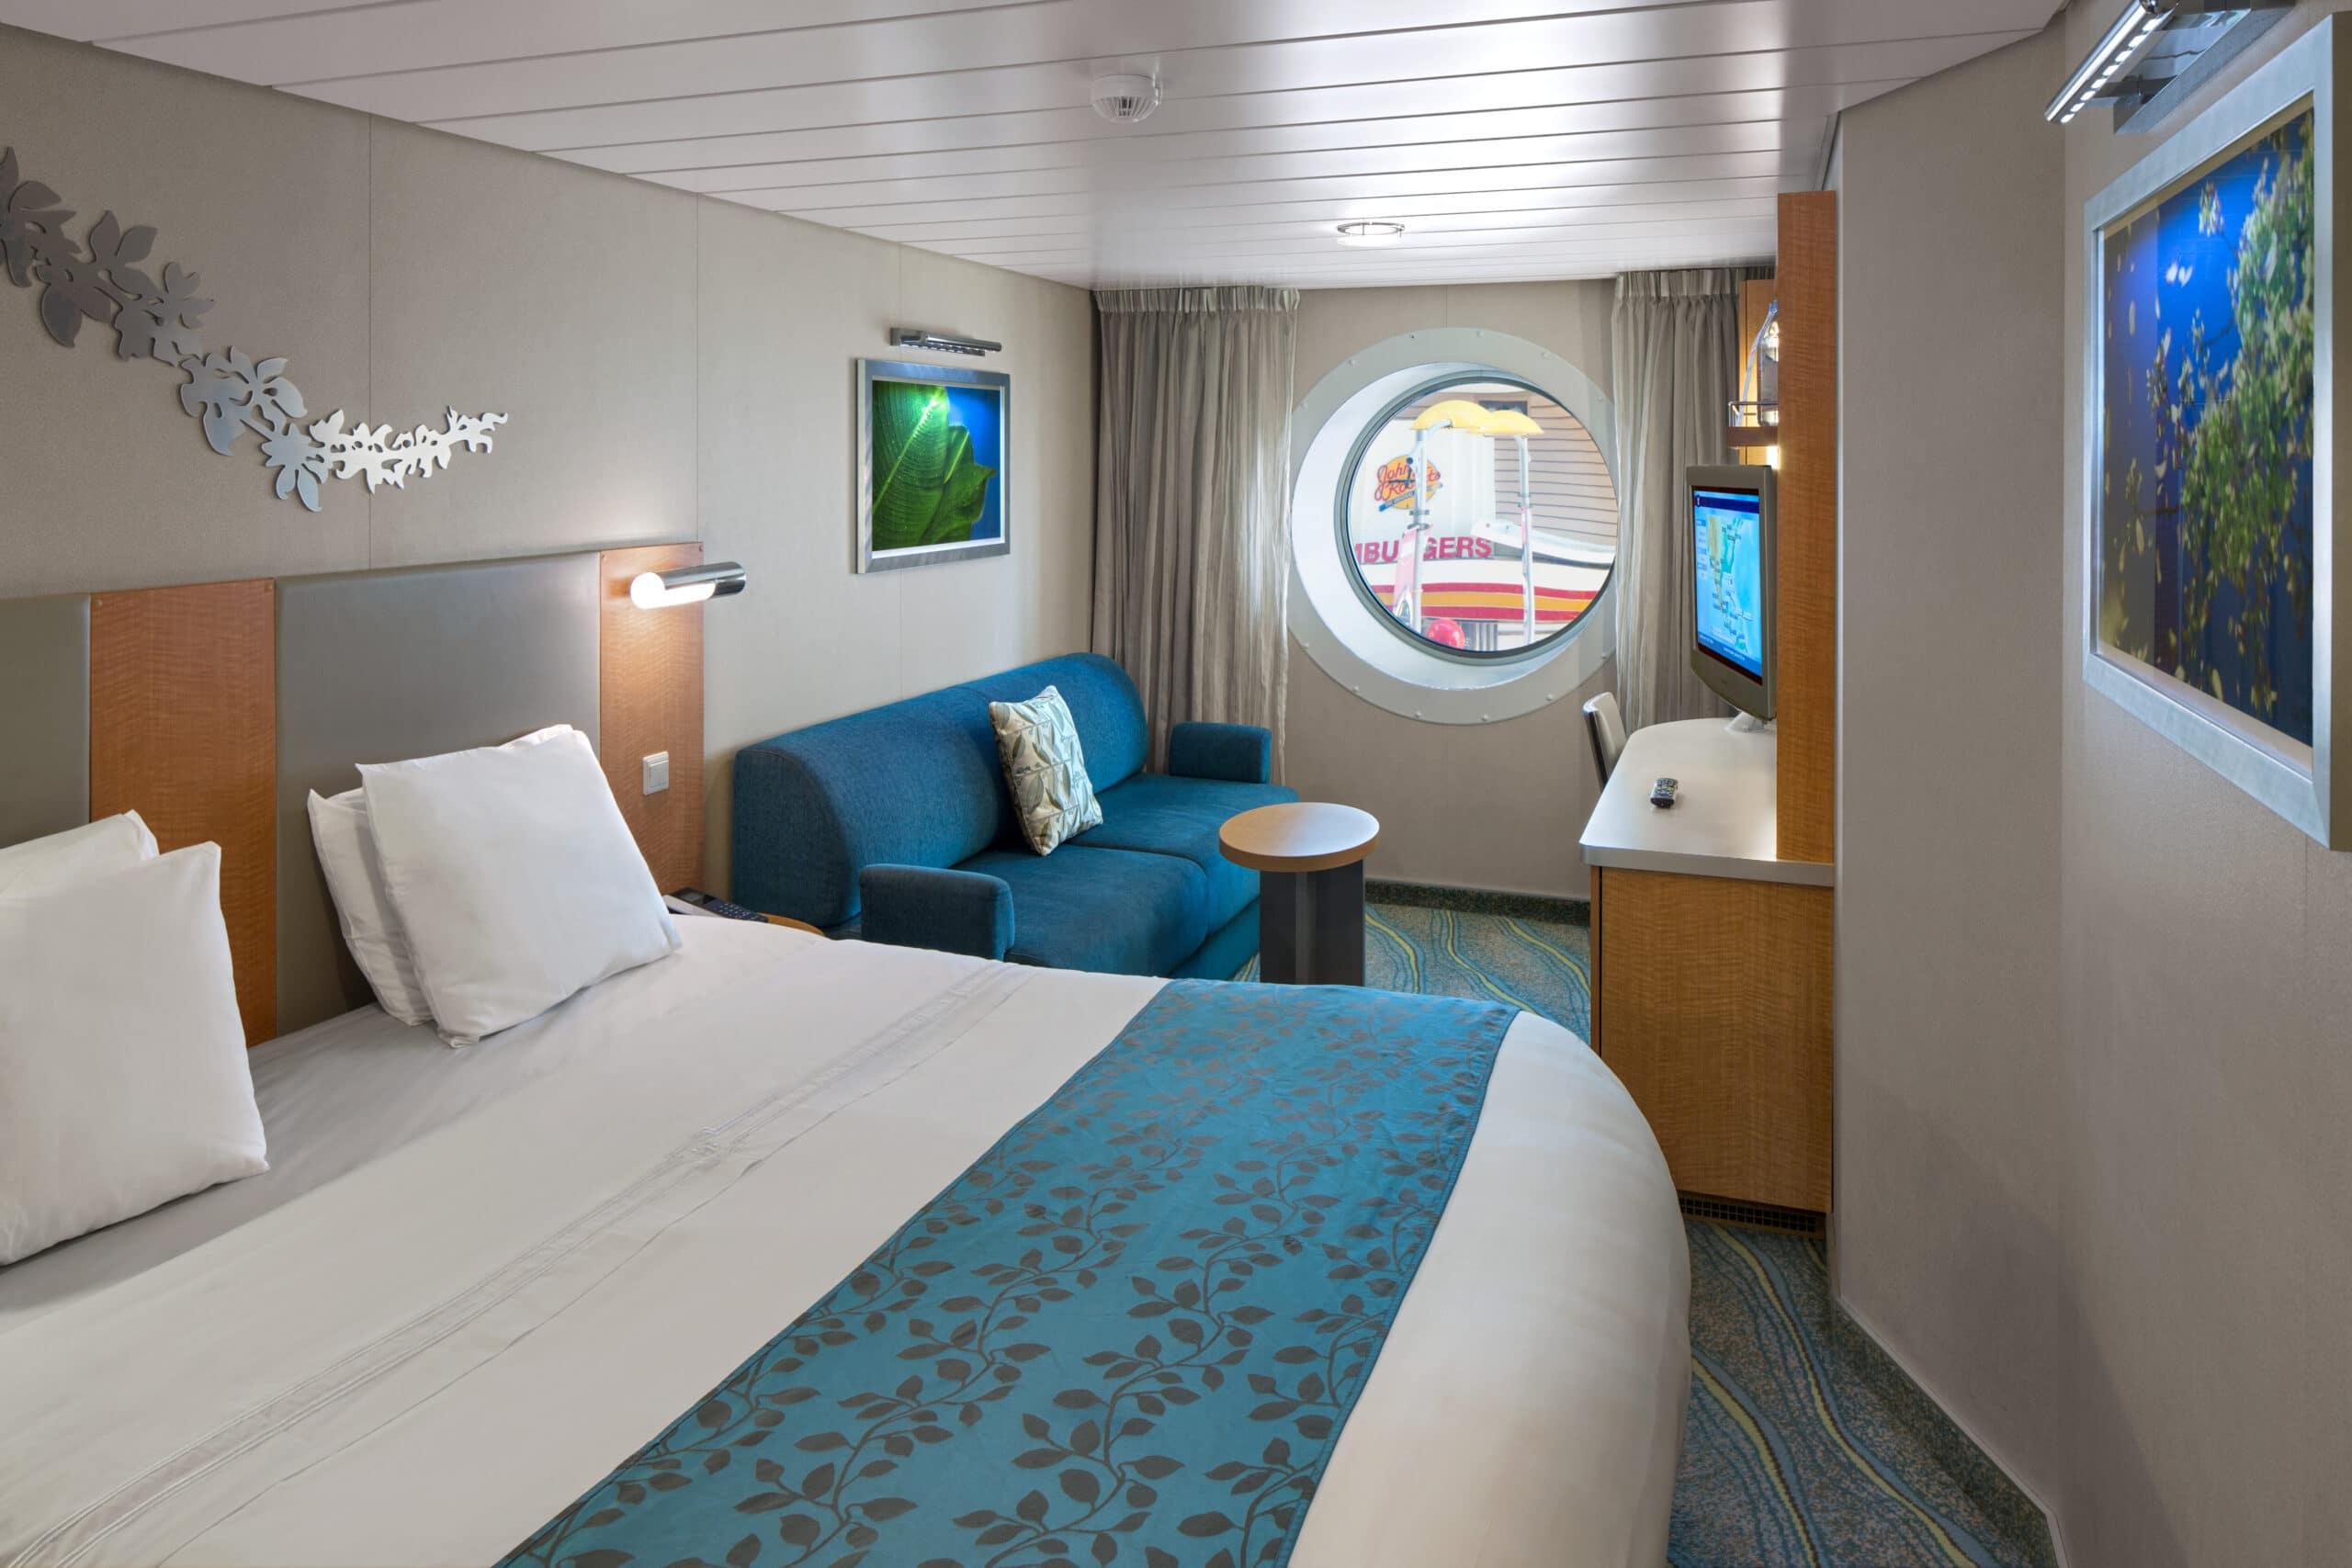 Royal-Caribbean-International-Allure-of-the-Seas-Oasis-of-the-seas-schip-cruiseschip-categorie-2T-binnenhut-met-promenade-zicht